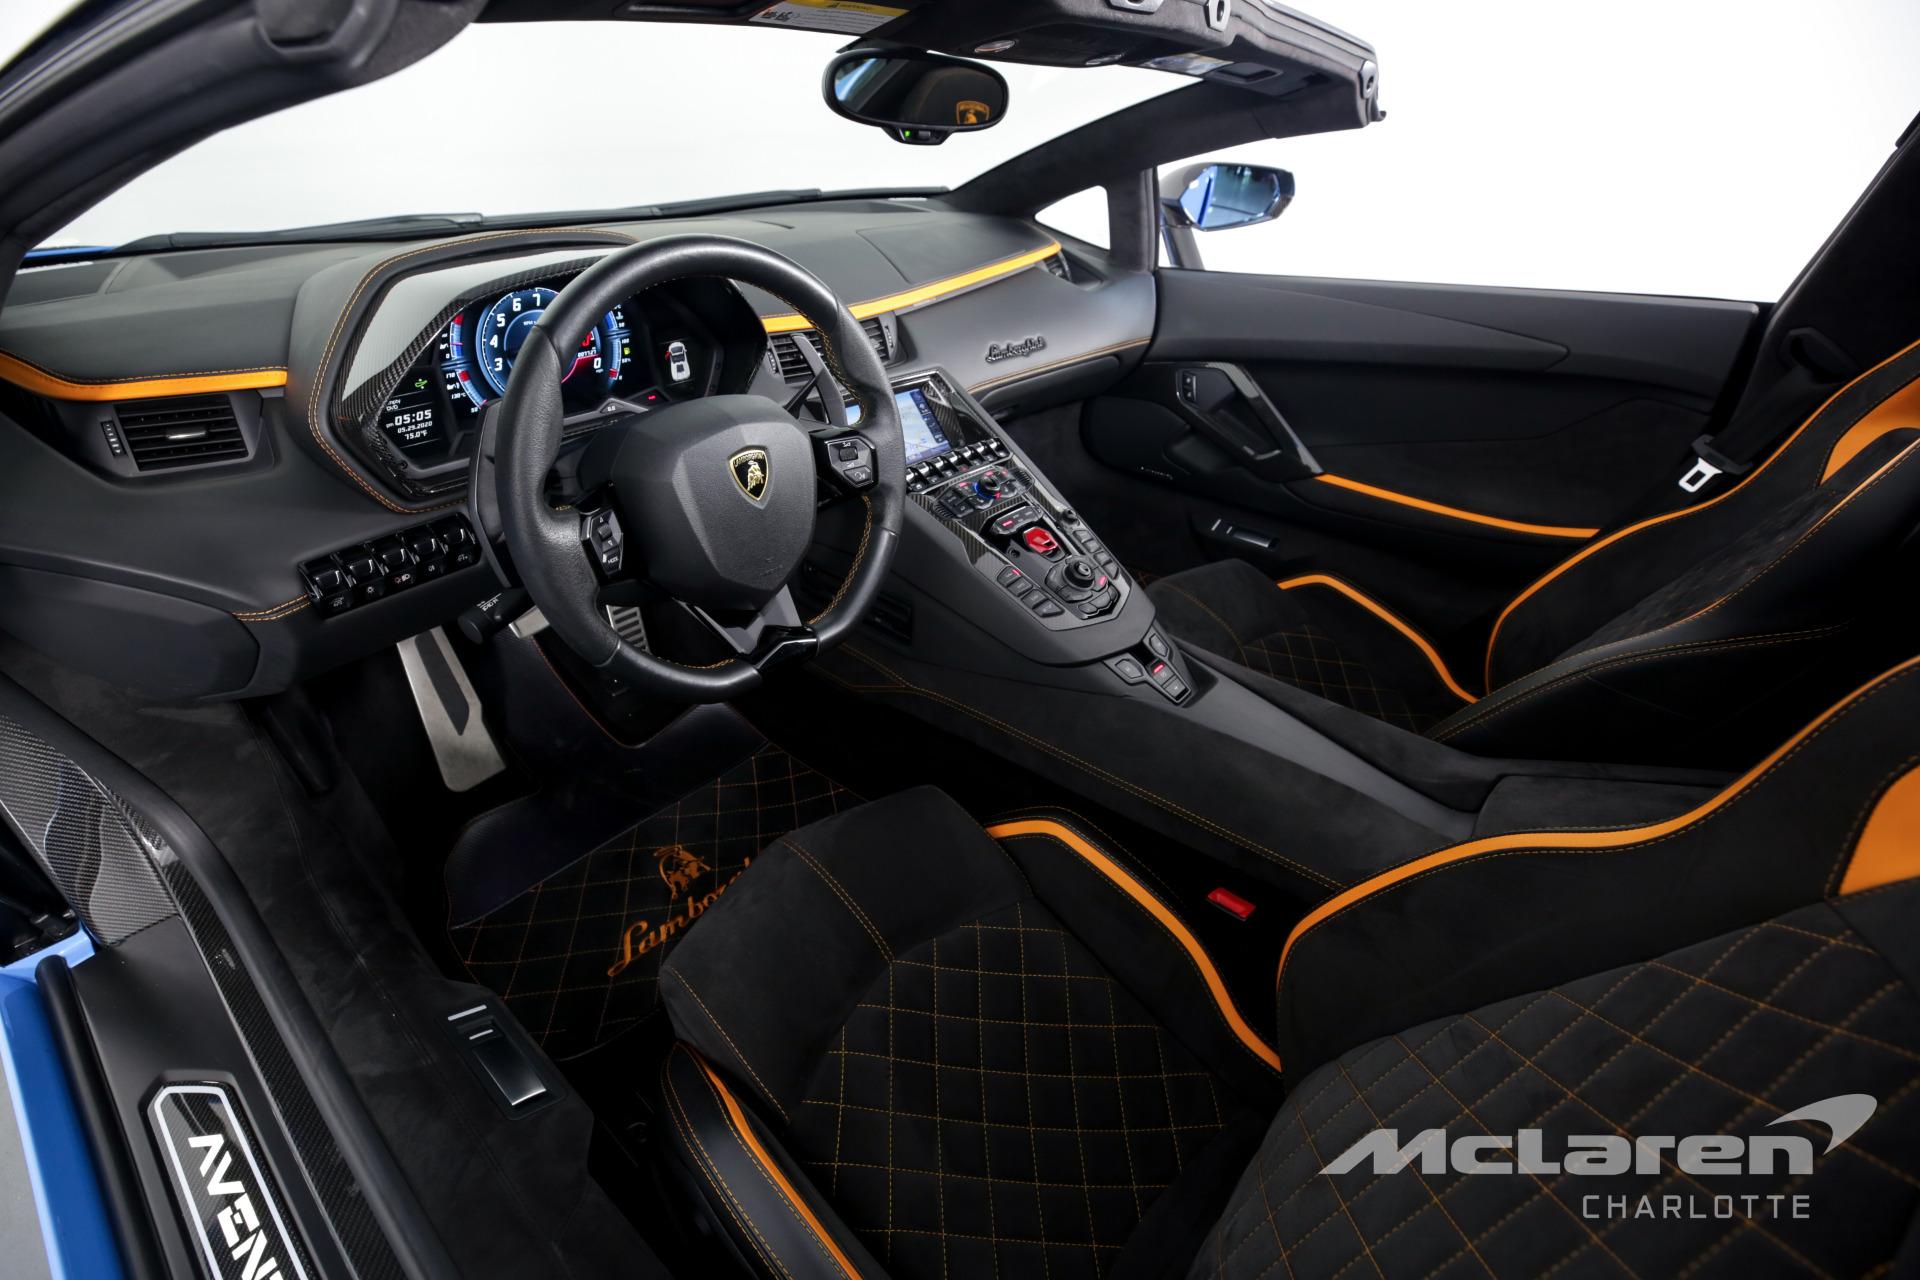 Used 2018 Lamborghini Aventador LP 740-4 S   Charlotte, NC